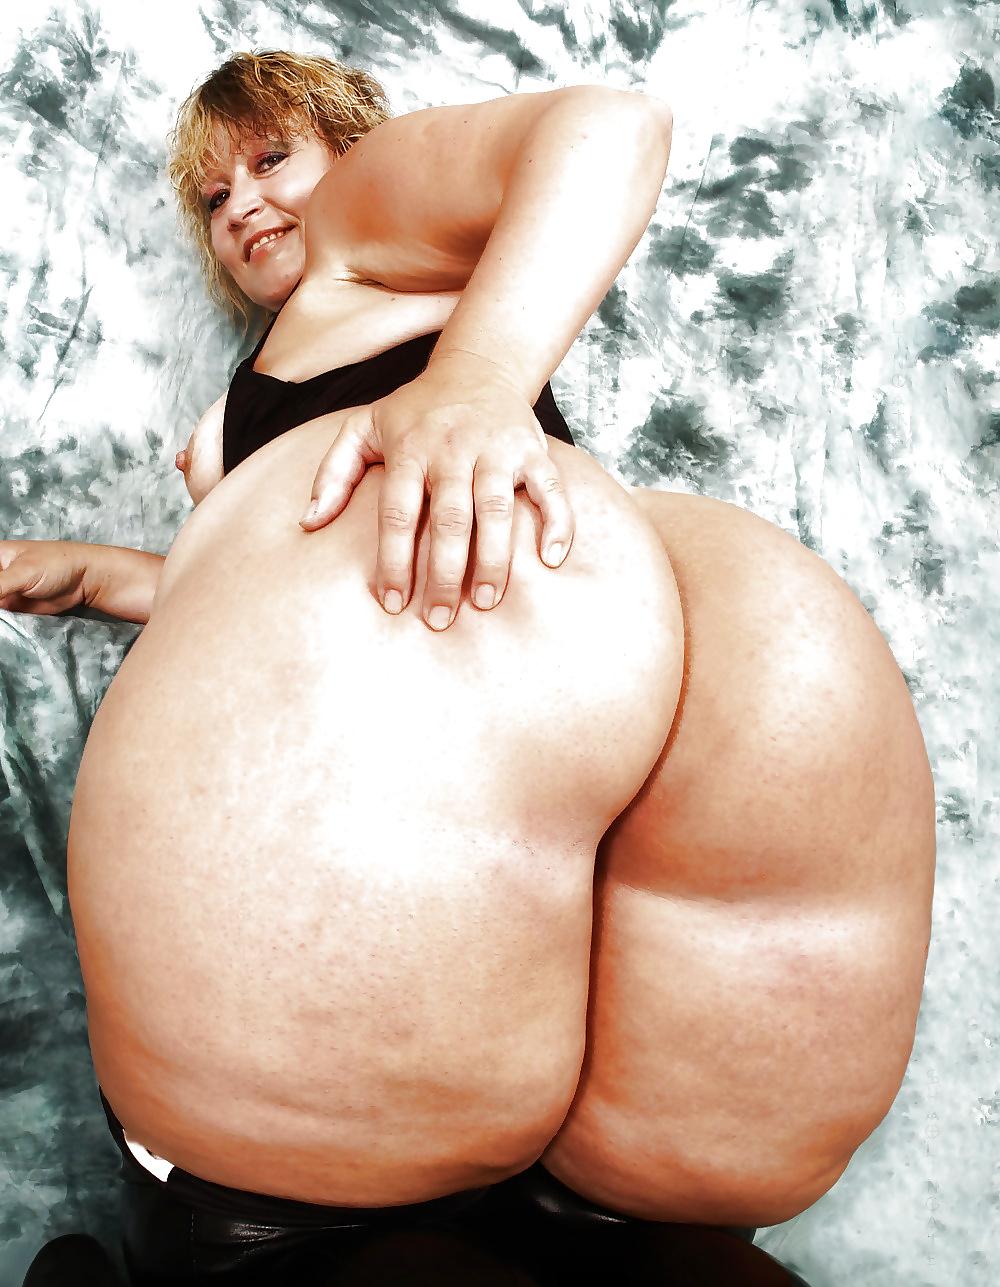 Model who wants world's biggest bum reveals how she grew six foot rear